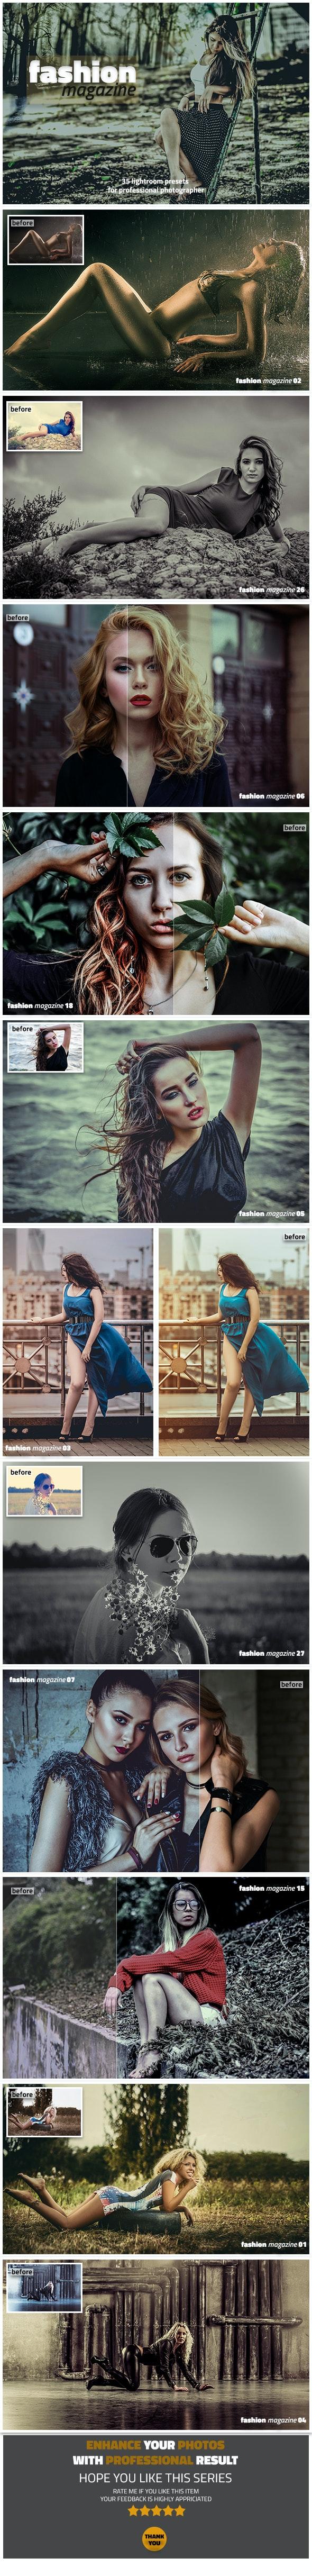 Fashion Magazine Lightroom Presets - Lightroom Presets Add-ons